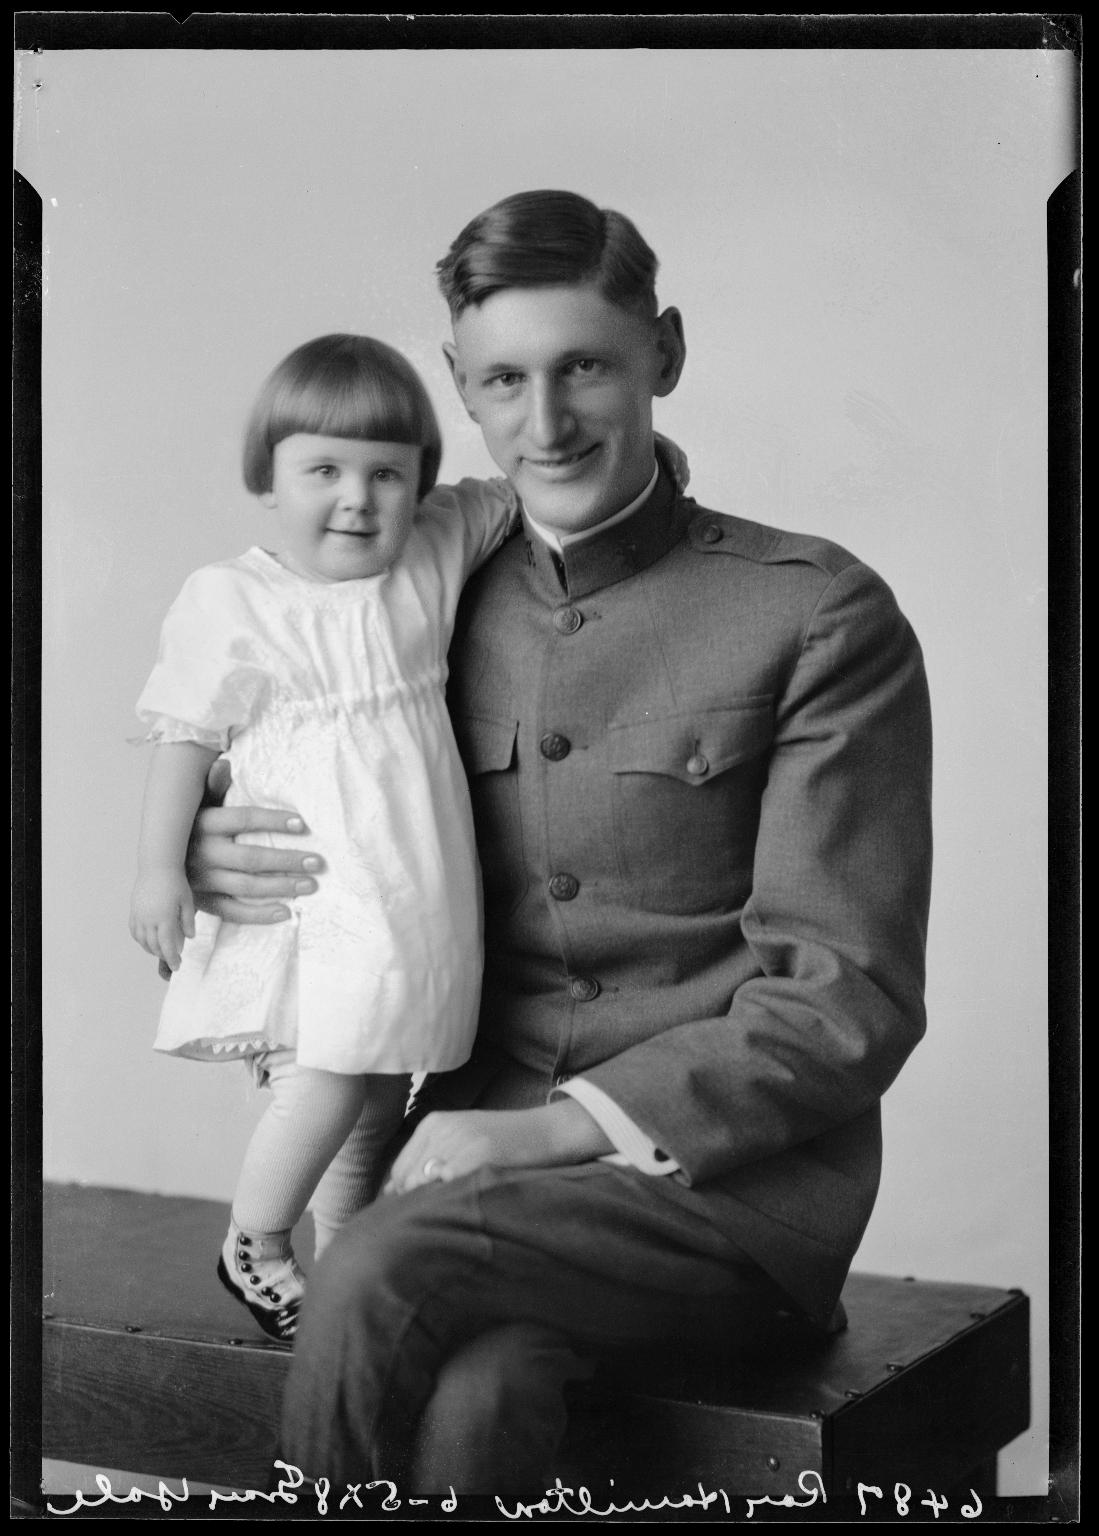 Portraits of Roy W. Hamilton and child